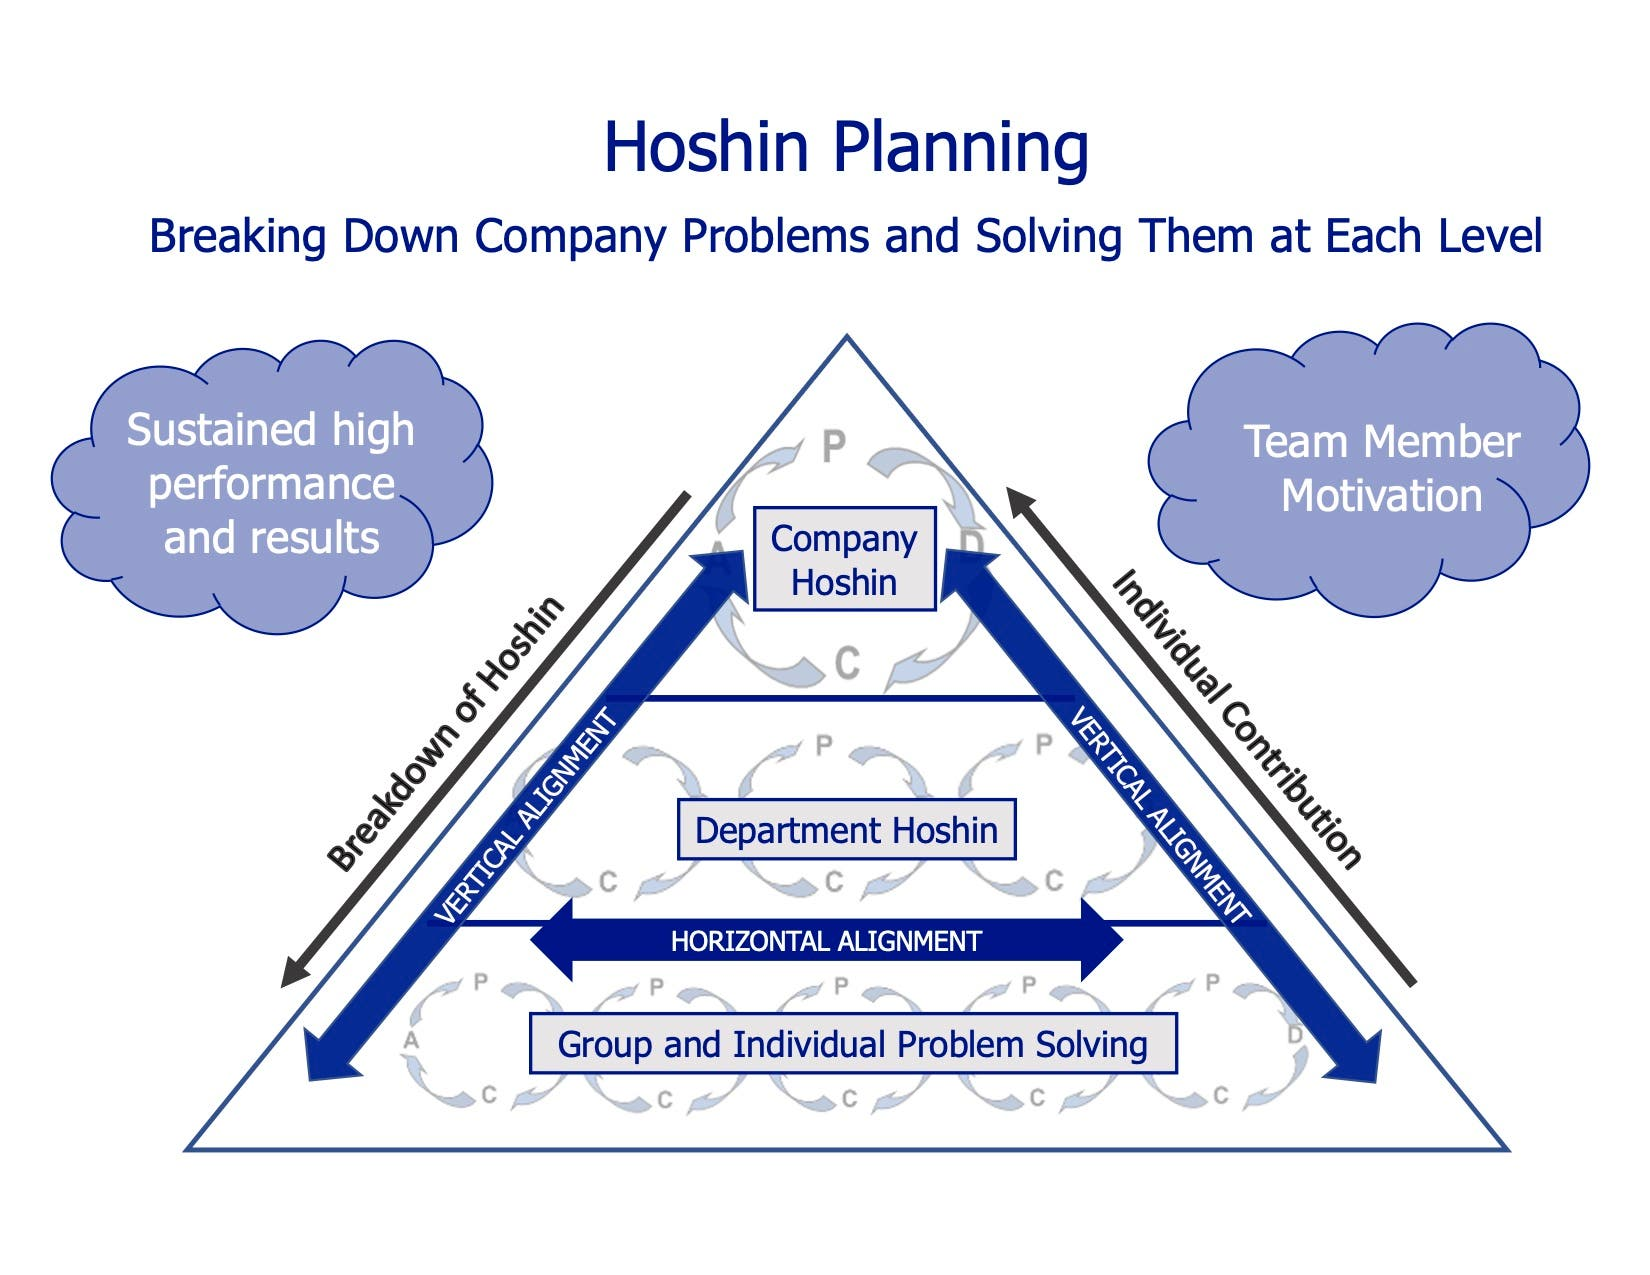 Hoshin Planning (Strategy Deployment)